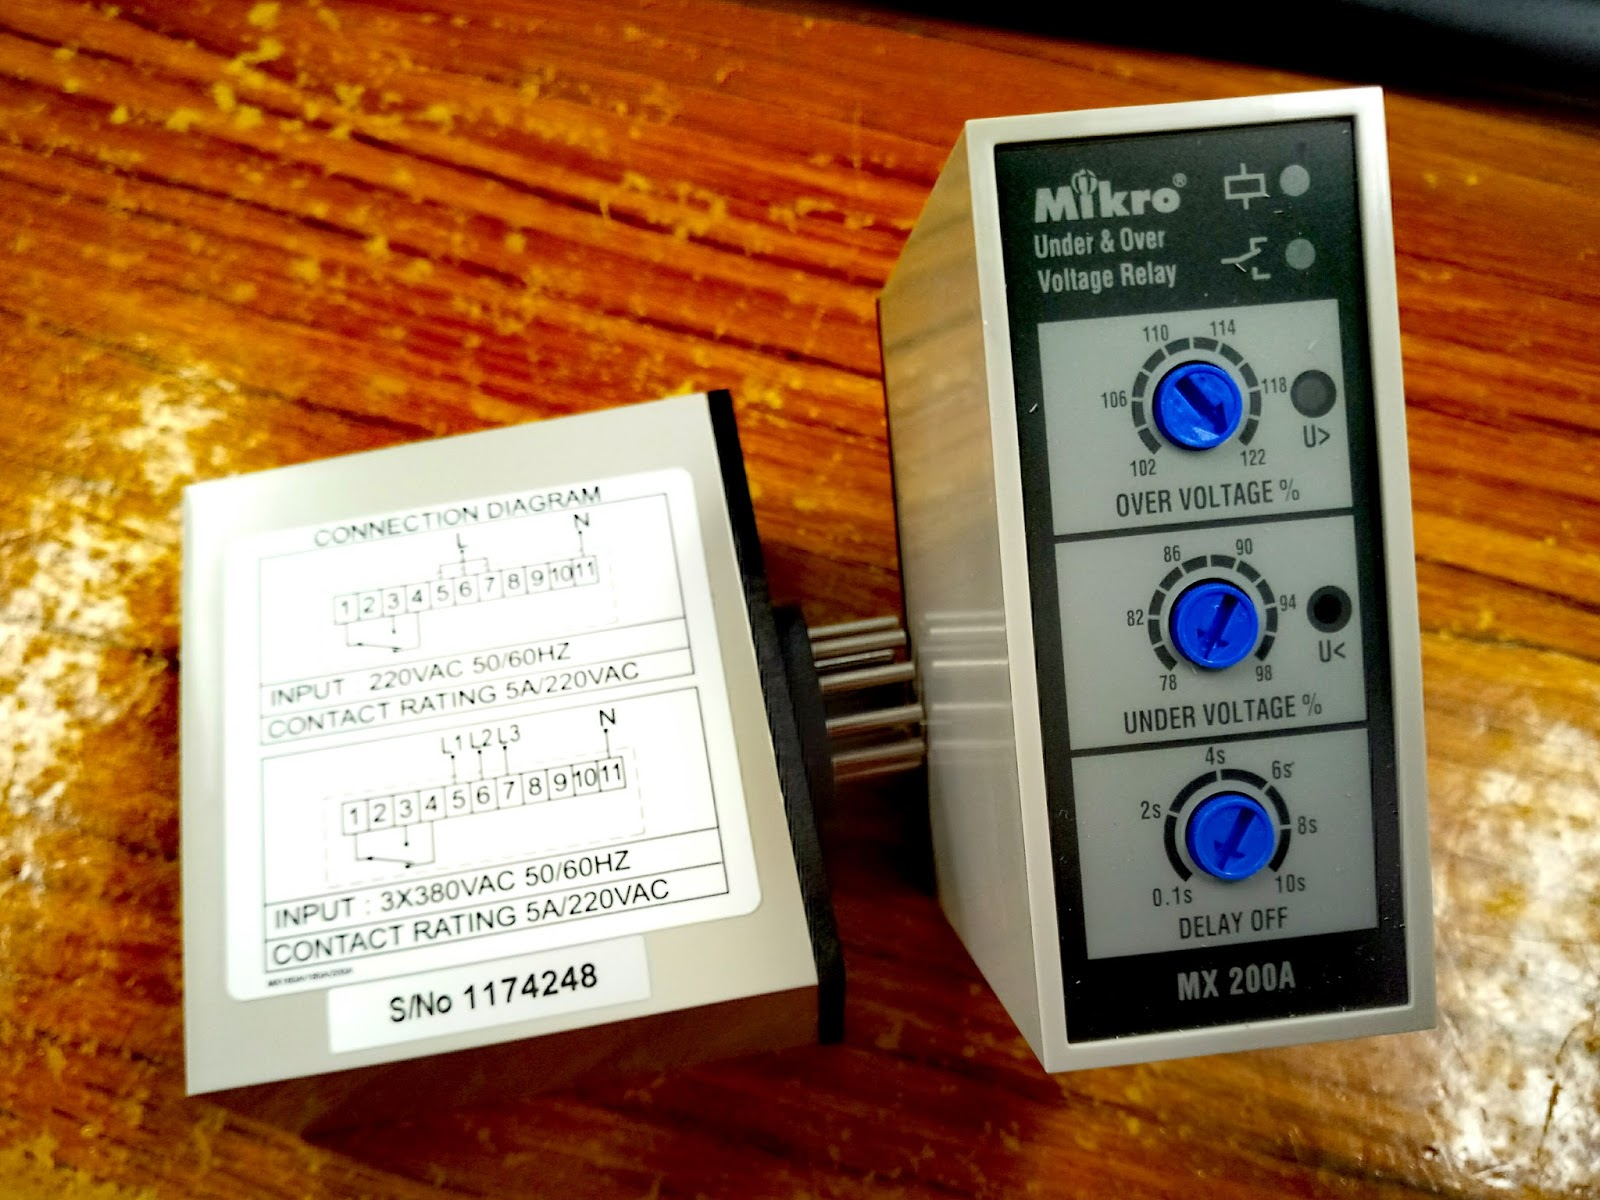 U8208 U660c U96fb U6a5f Hing Cheong   Overvoltage Phase Monitoring Relay In Hong Kong Market